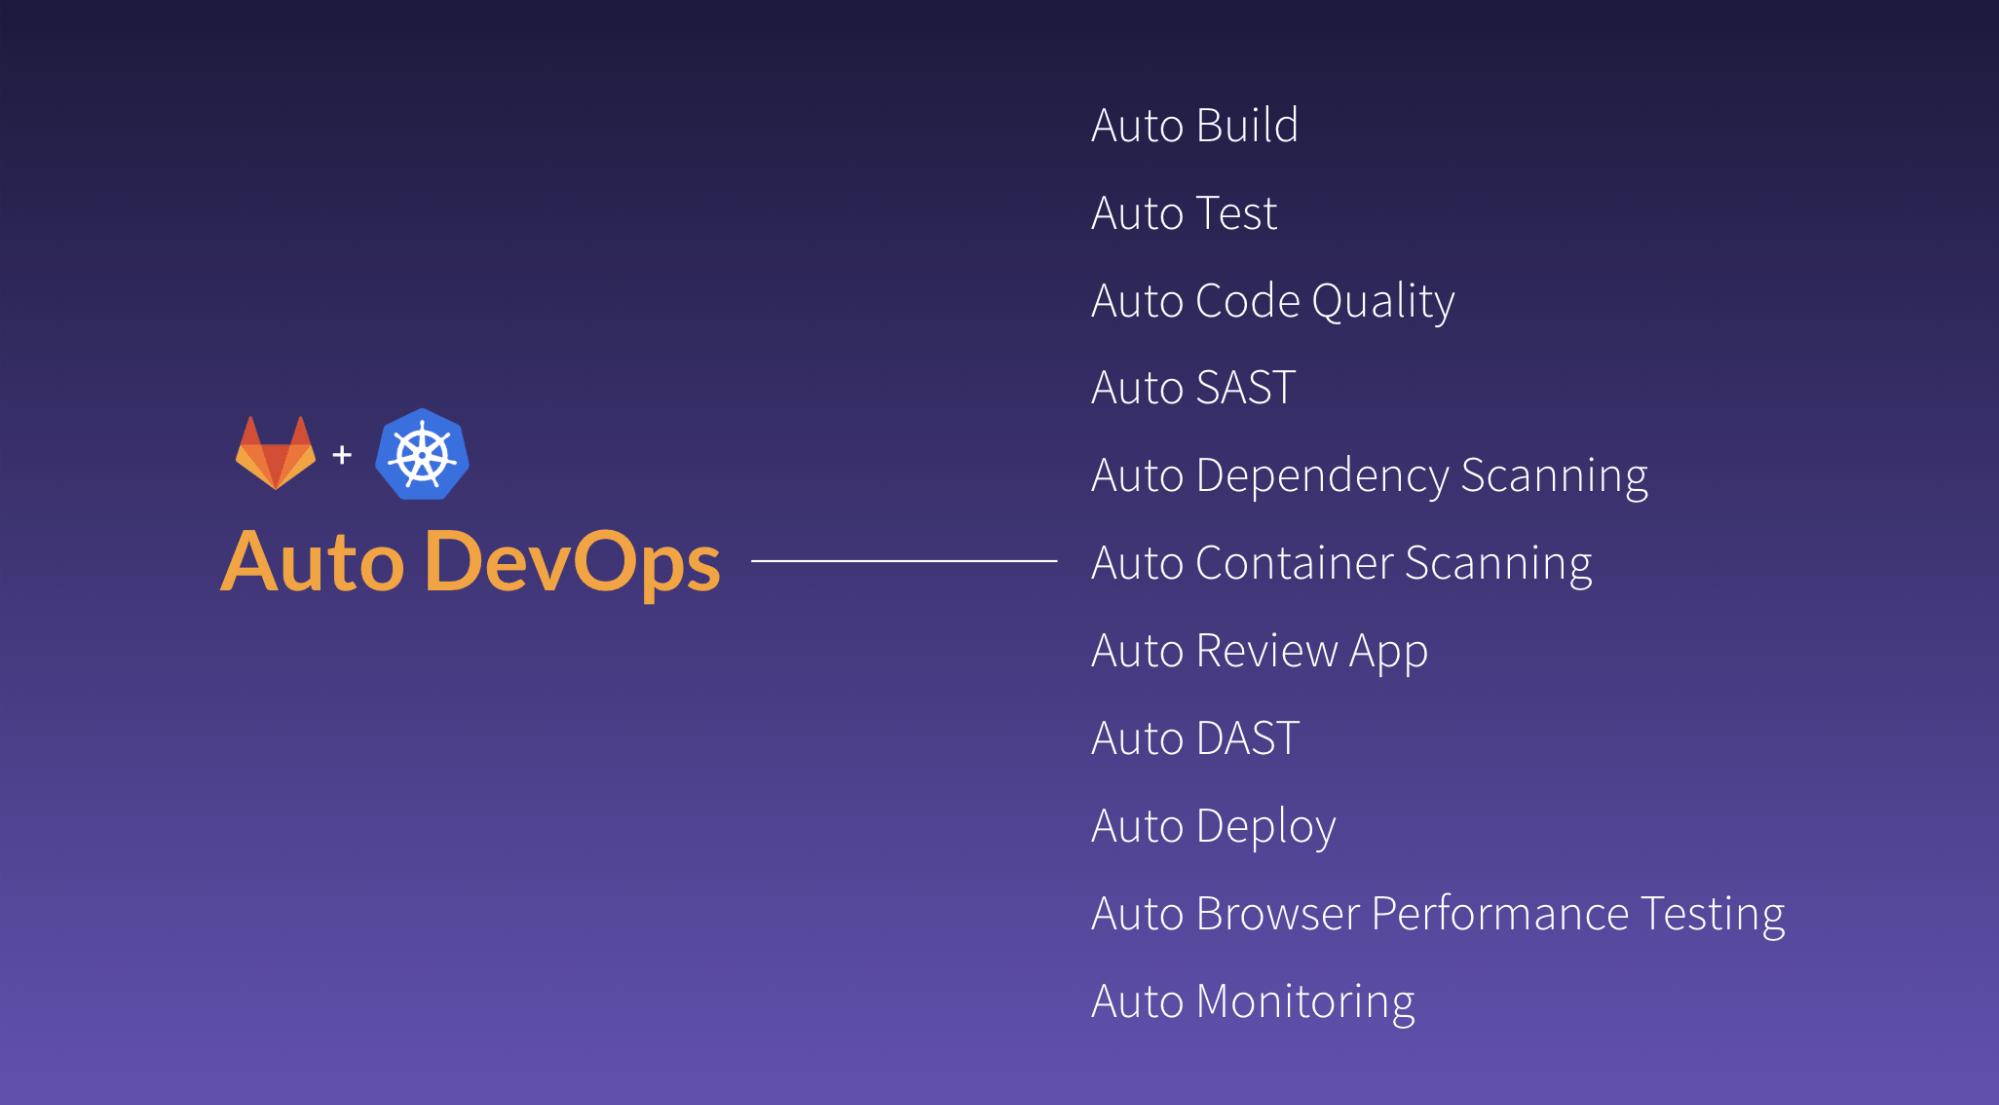 GitLab Auto DevOps